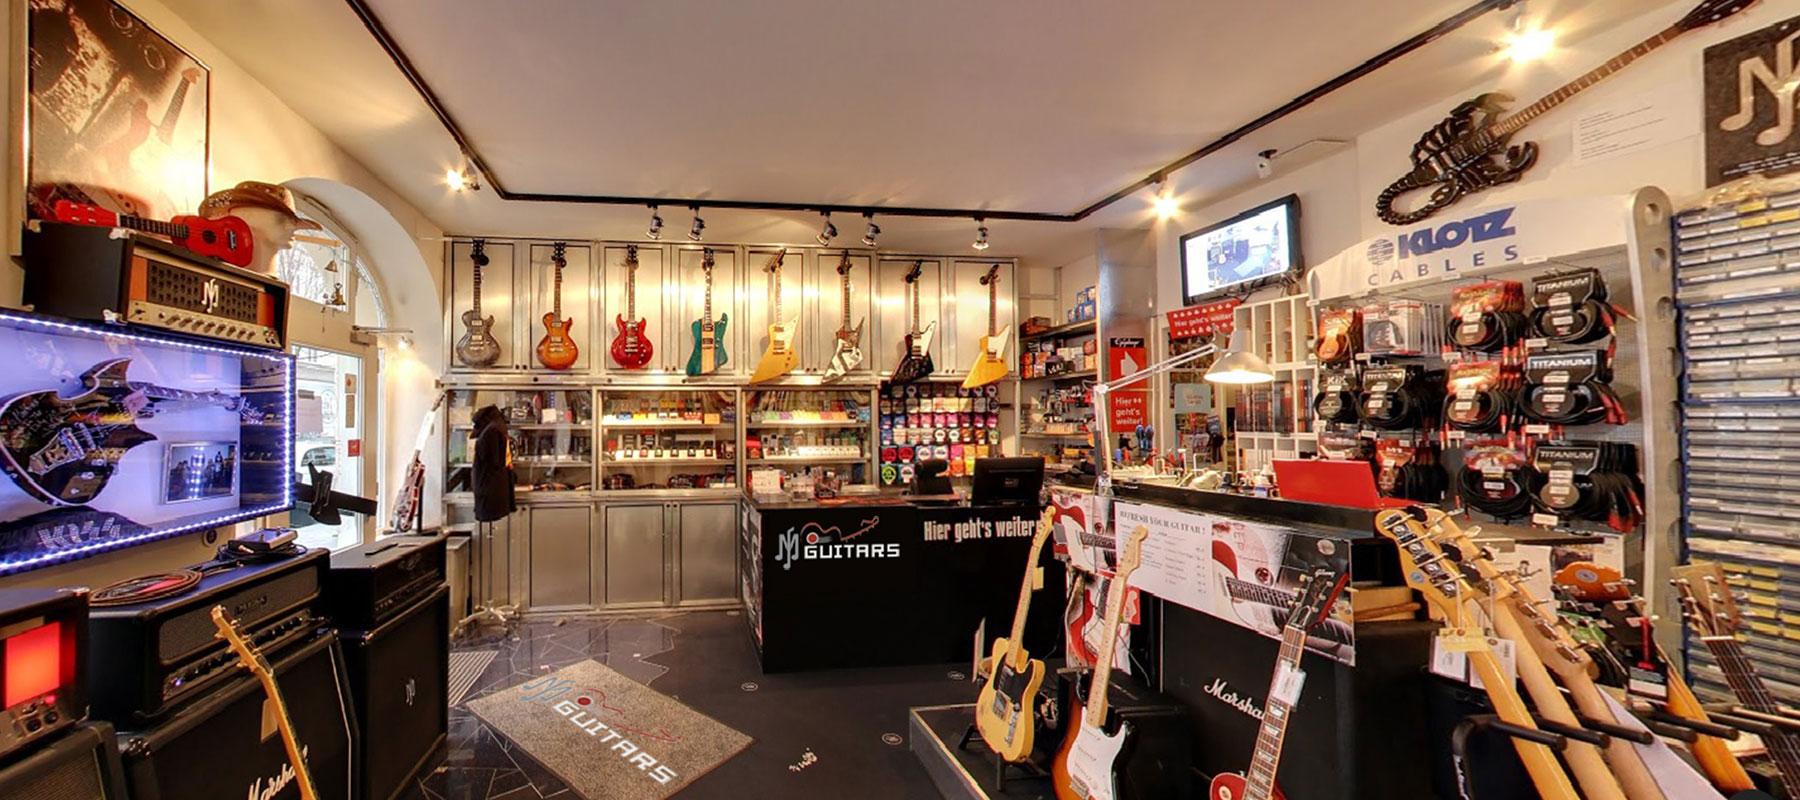 musikgesch ft m nchen mj guitars musikladen mj guitars. Black Bedroom Furniture Sets. Home Design Ideas